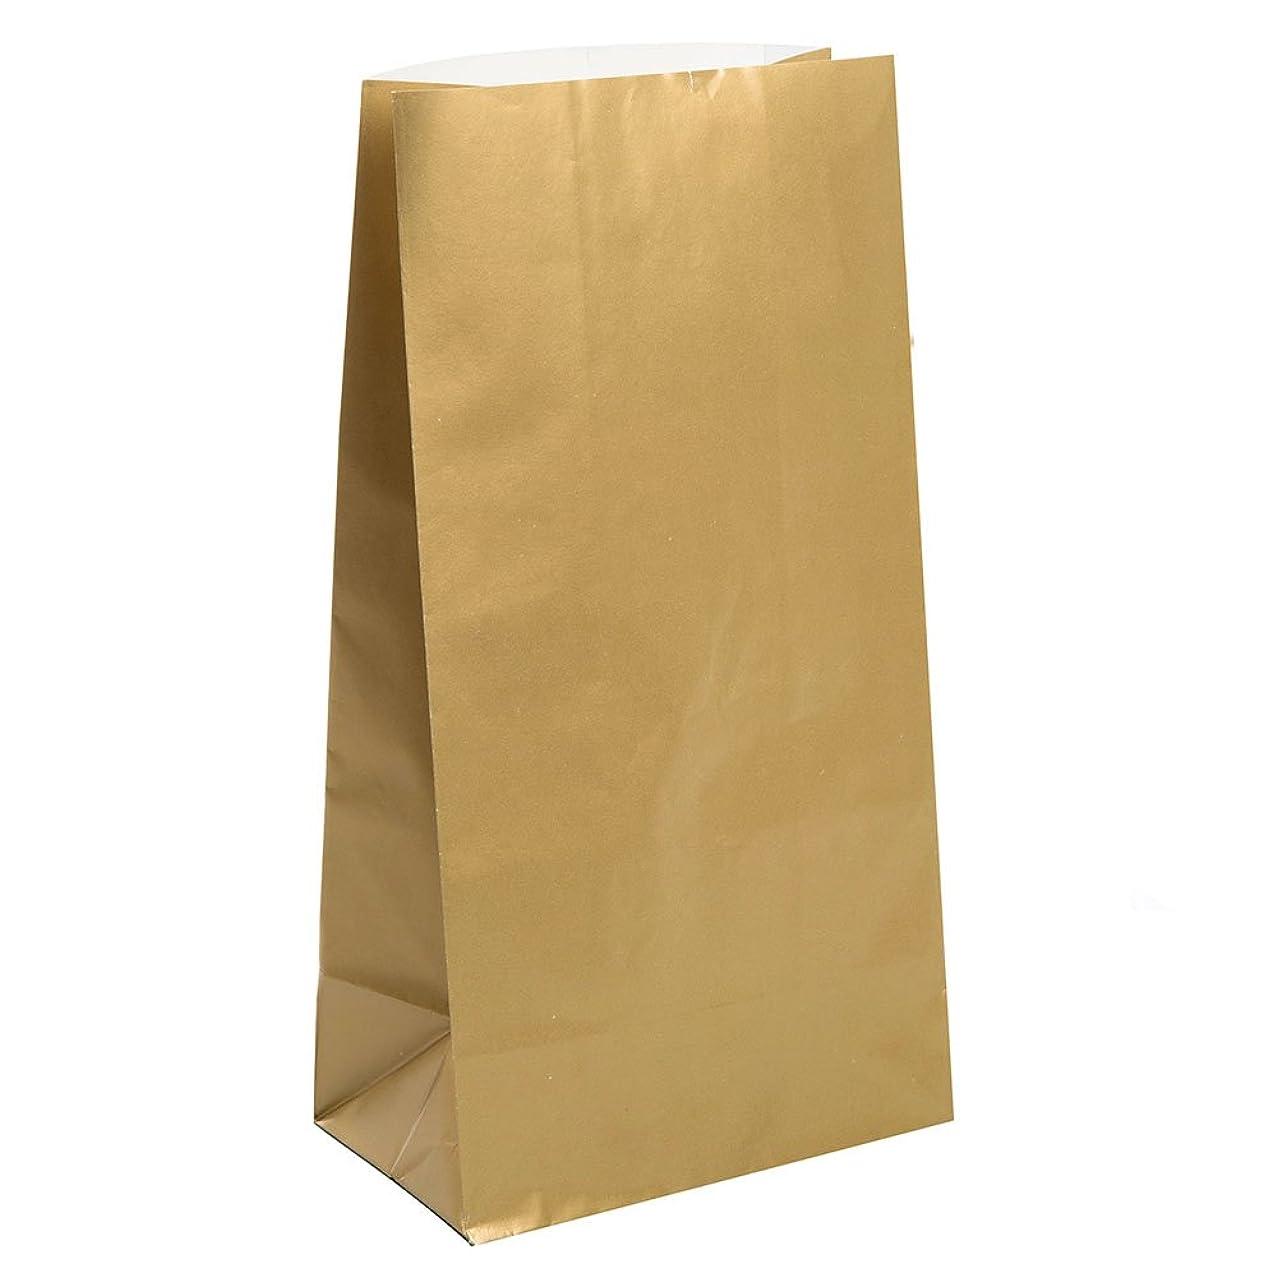 Metallic Gold Paper Favor Bags, 10ct